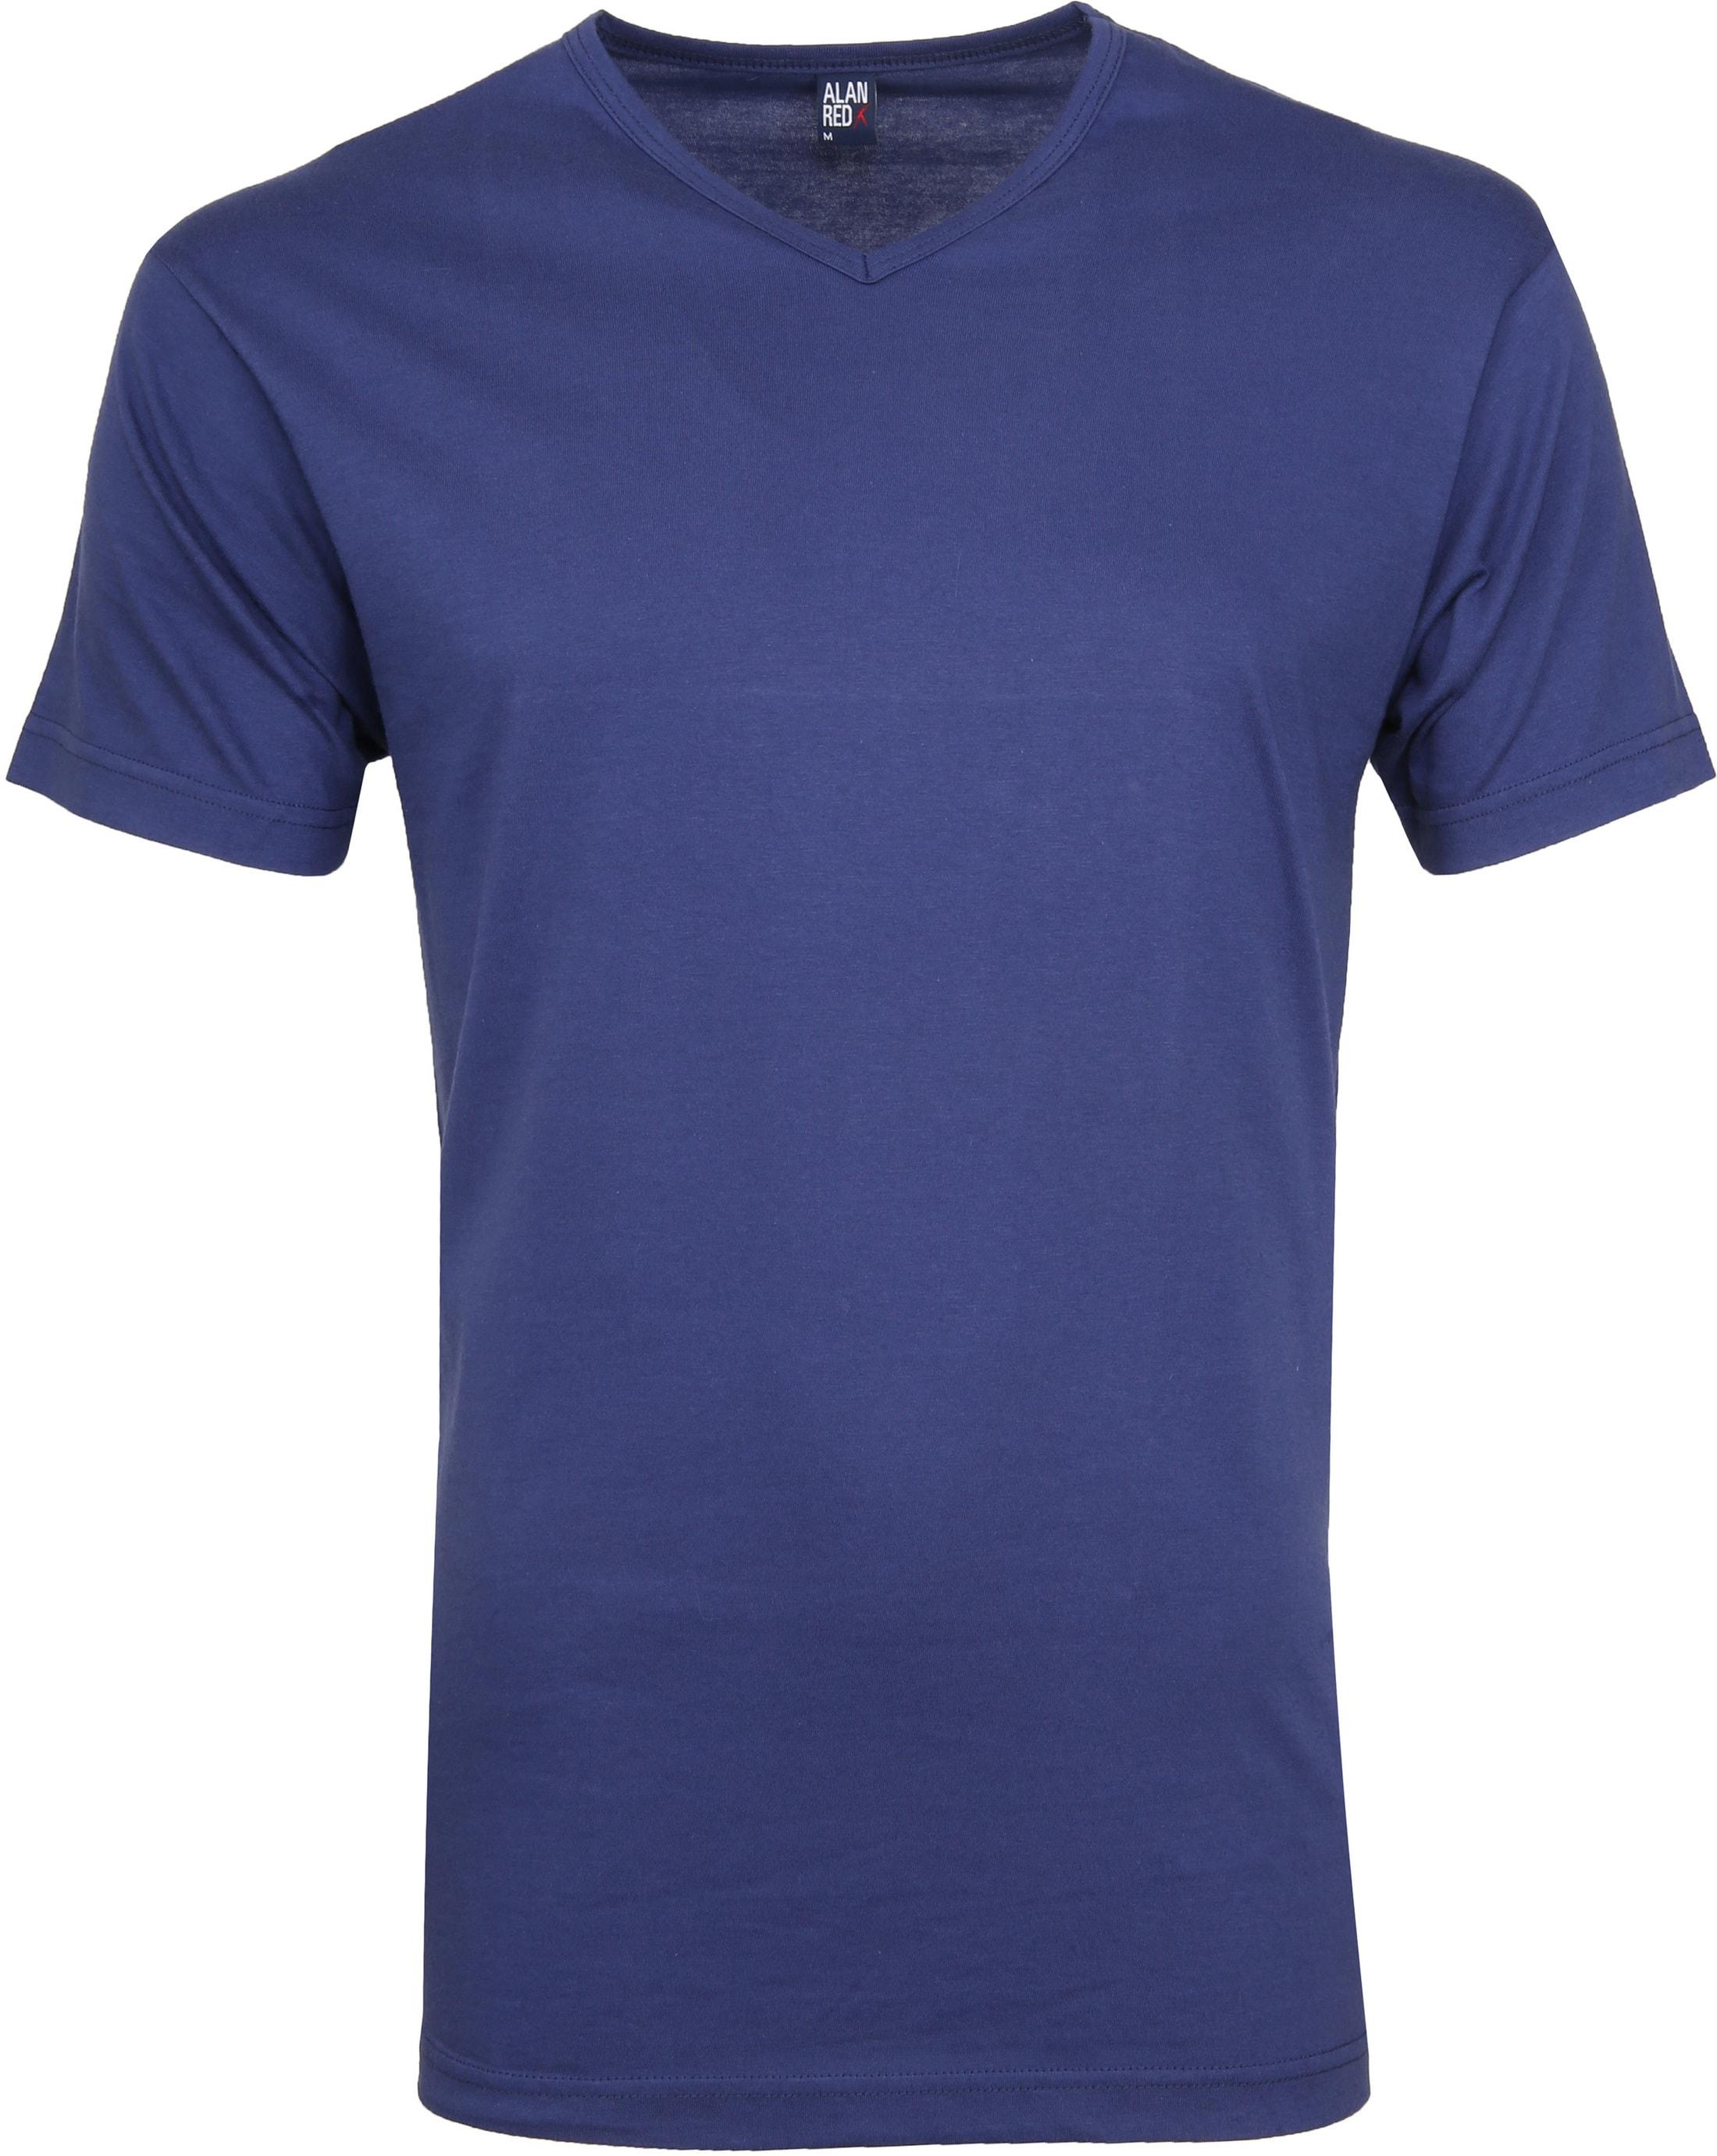 Alan Red Vermont T-shirts V-Hals Blauw (2Pack) foto 1